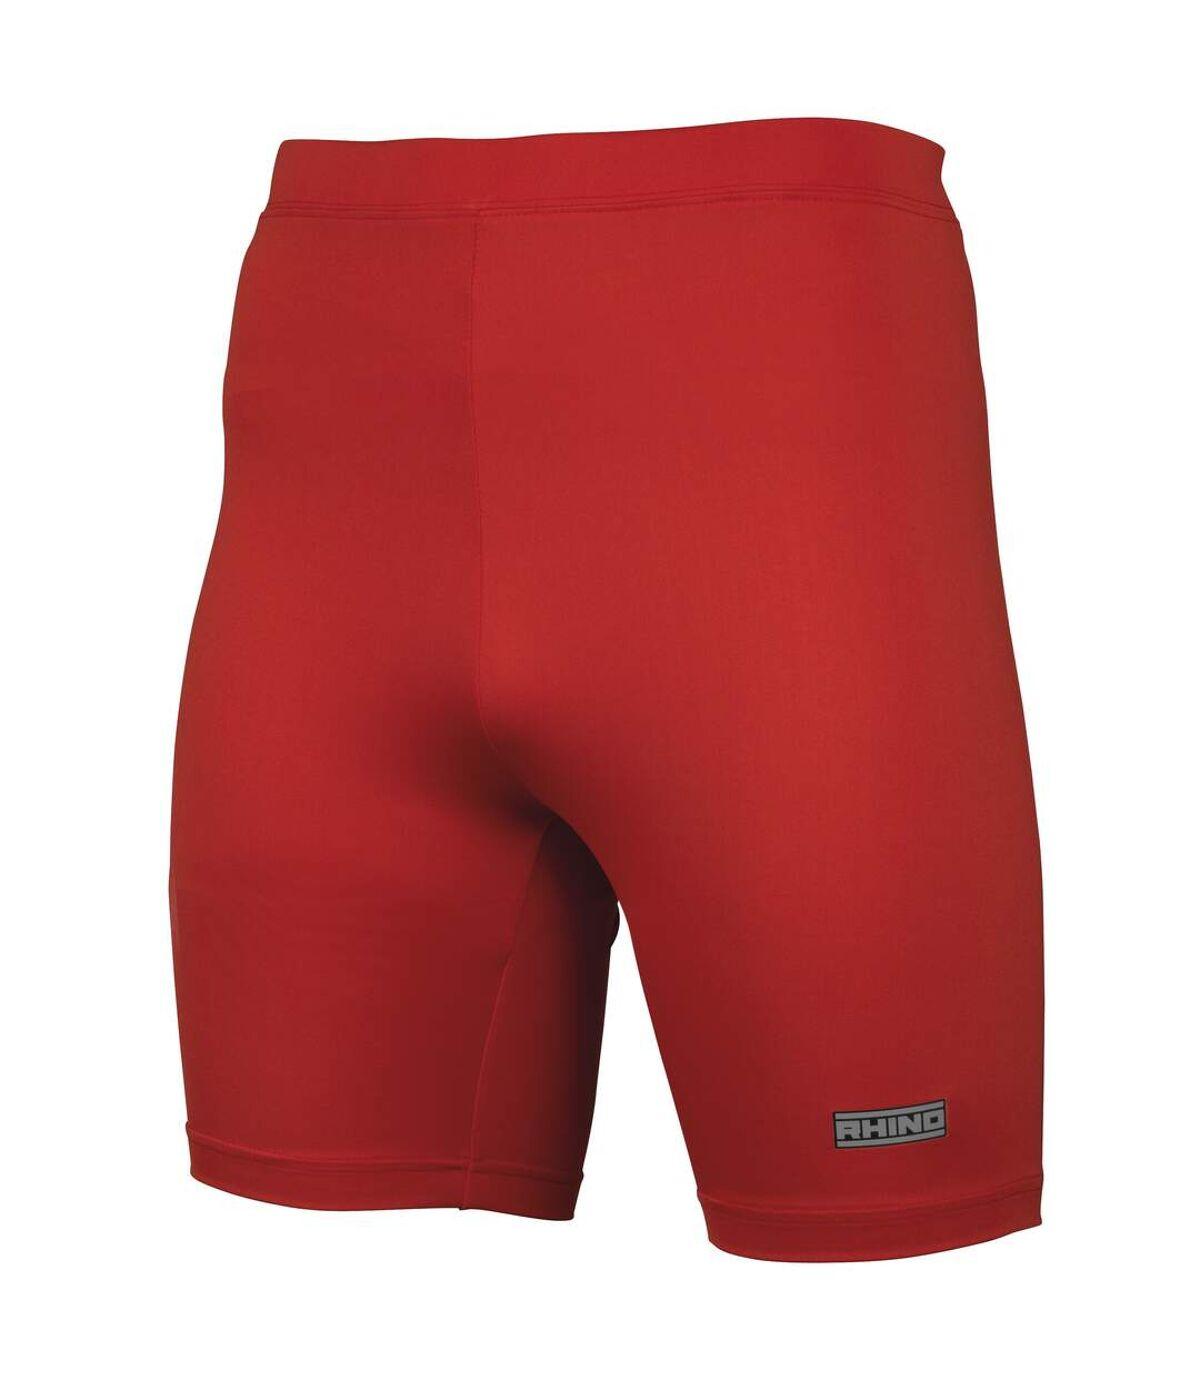 Rhino Mens Sports Base Layer Shorts (Red) - UTRW1278